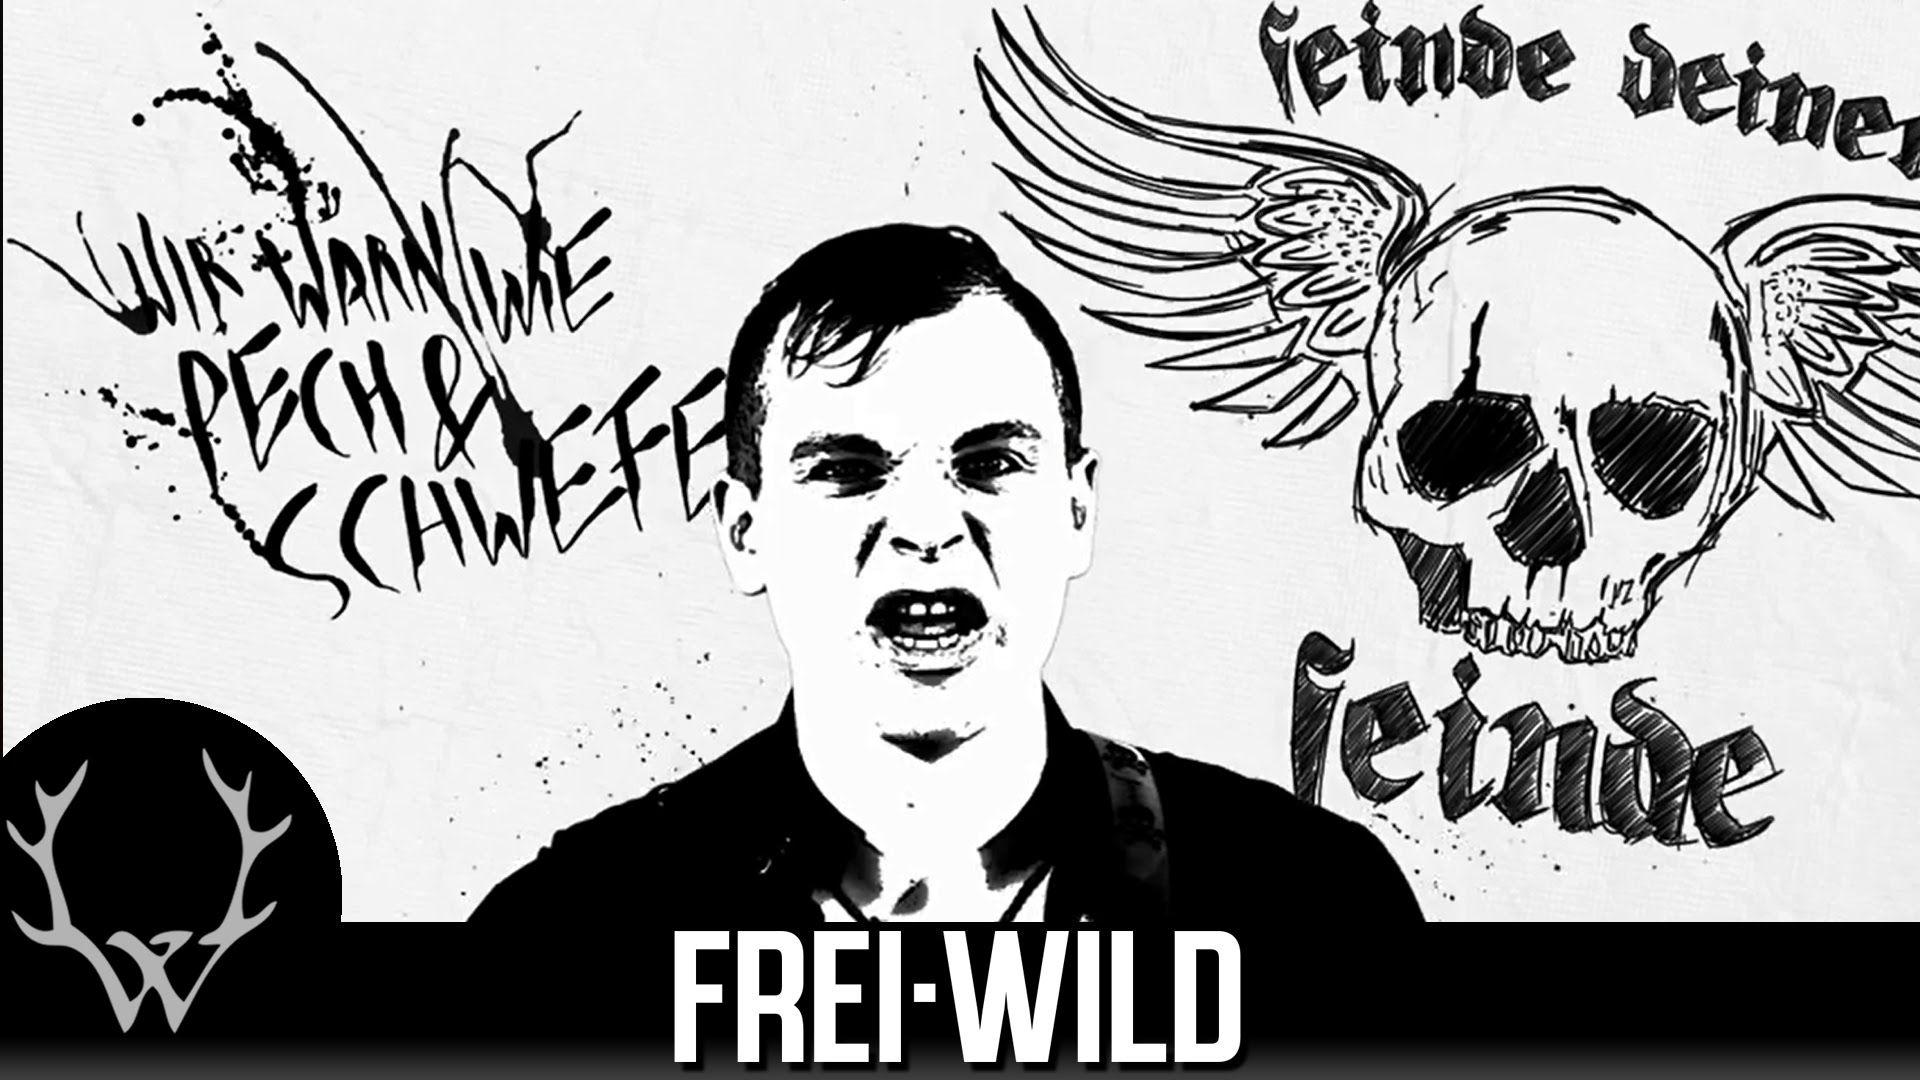 Inspirational Frei Wild Feinde Deiner Feinde Album